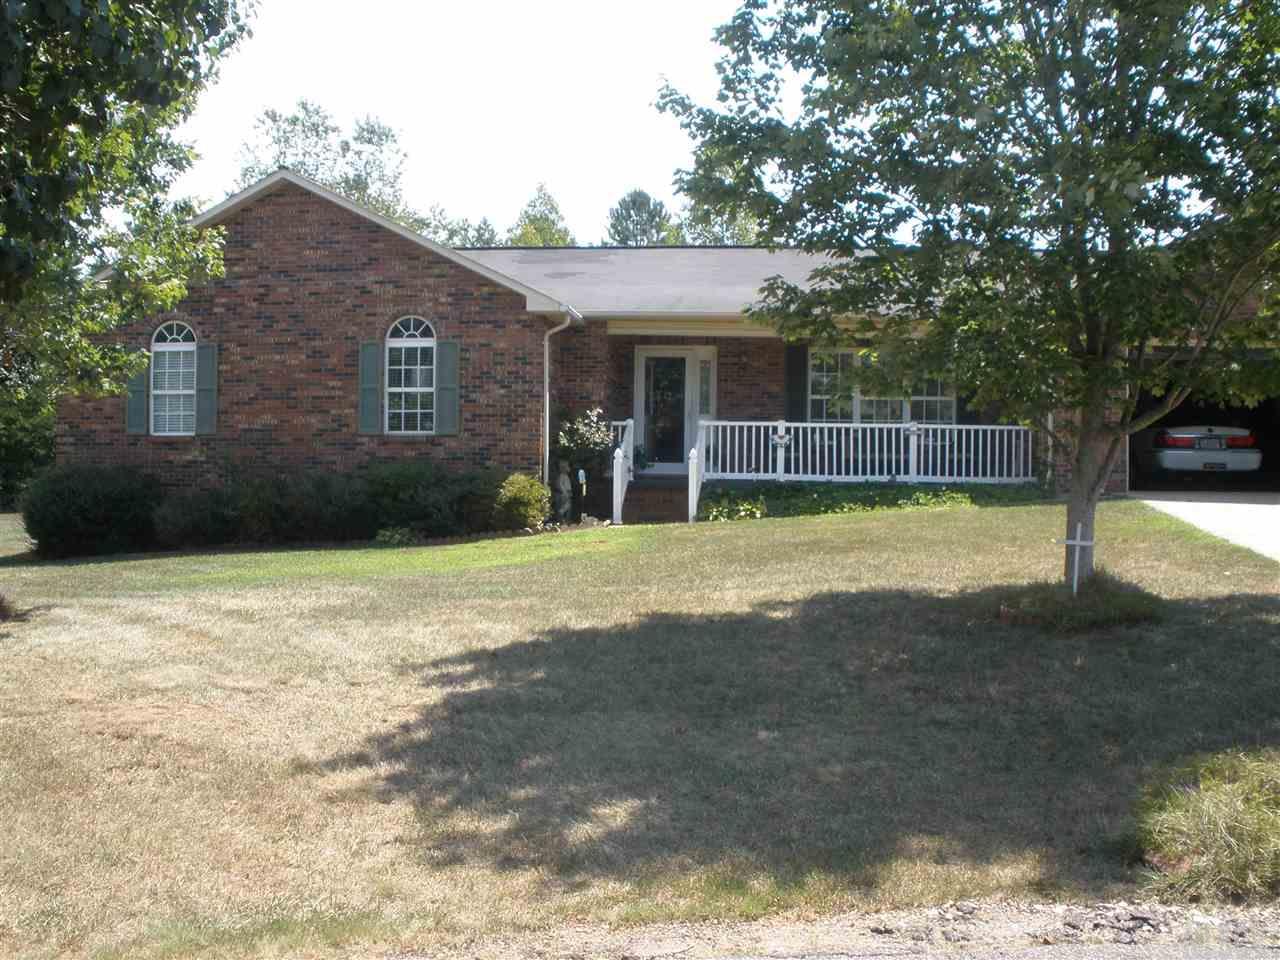 Real Estate for Sale, ListingId: 34846489, Hickory,NC28602